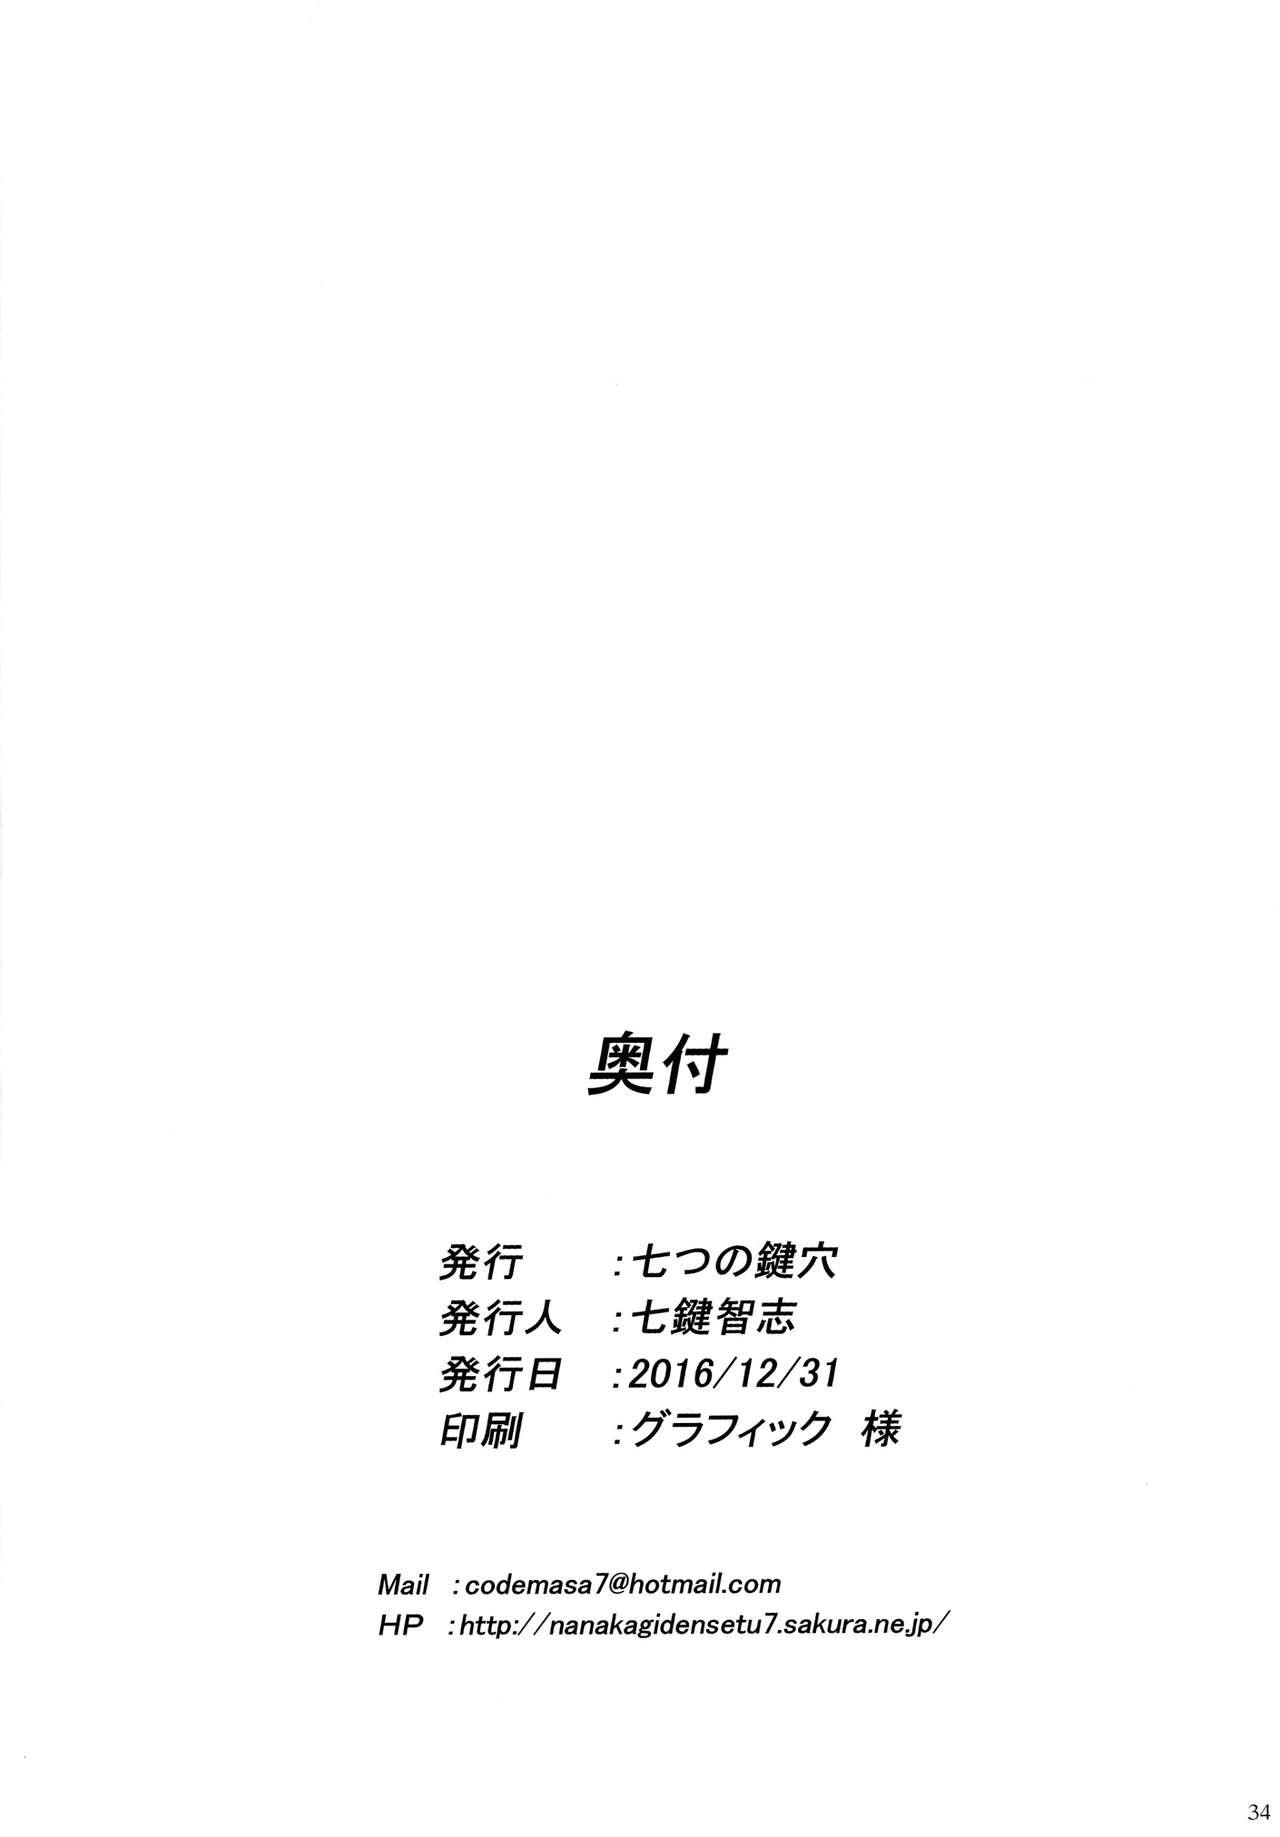 Gal Shota Cinderella 3 32